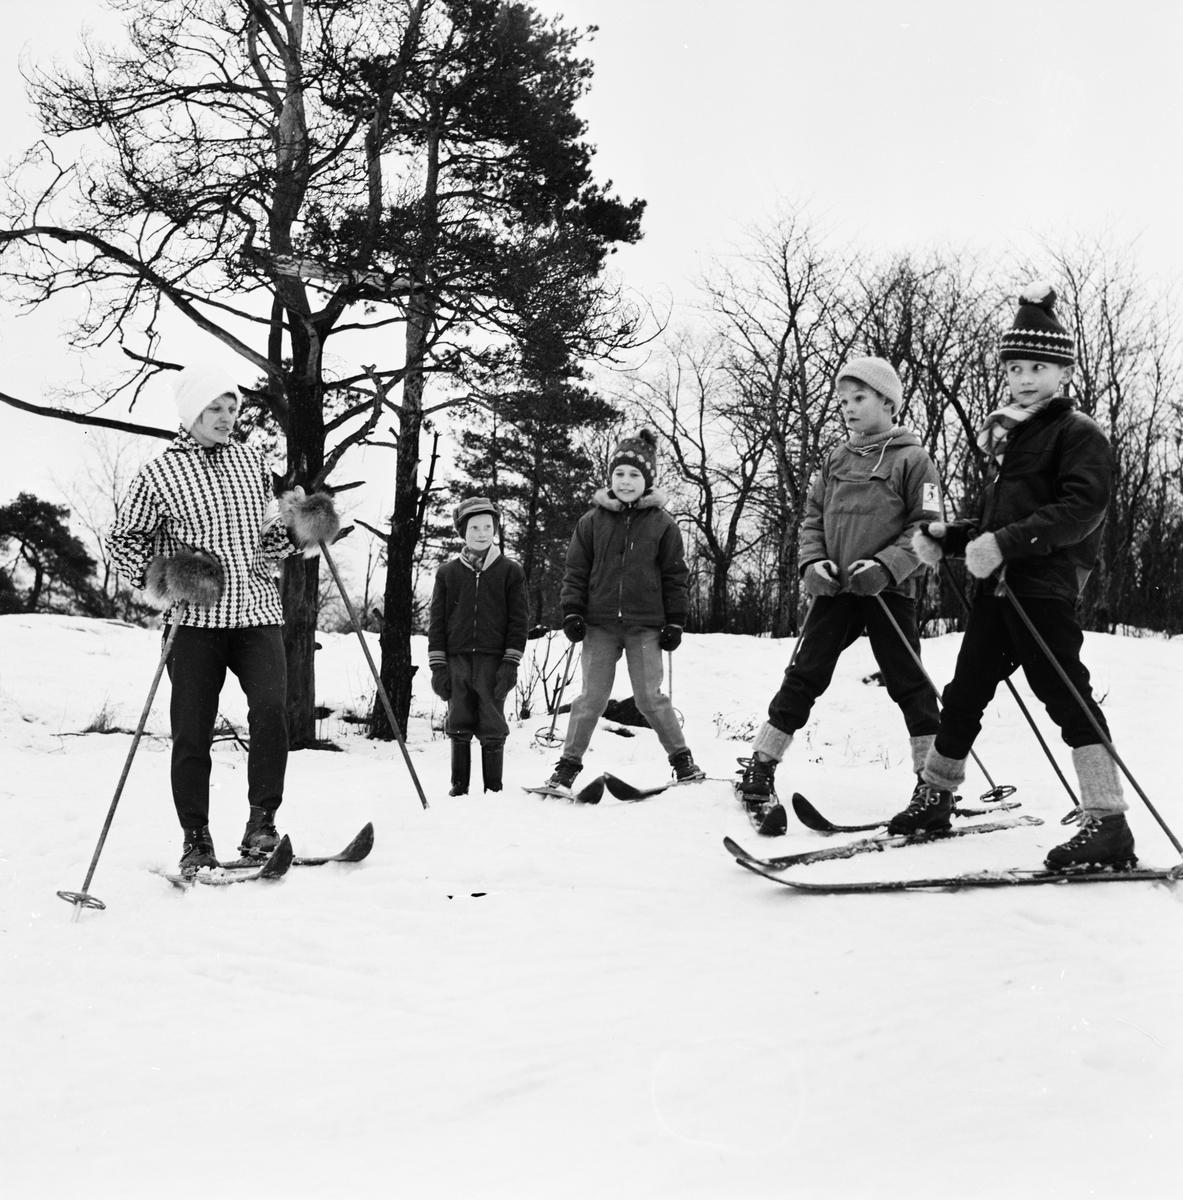 Barn åker skidor, Uppsala februari 1961